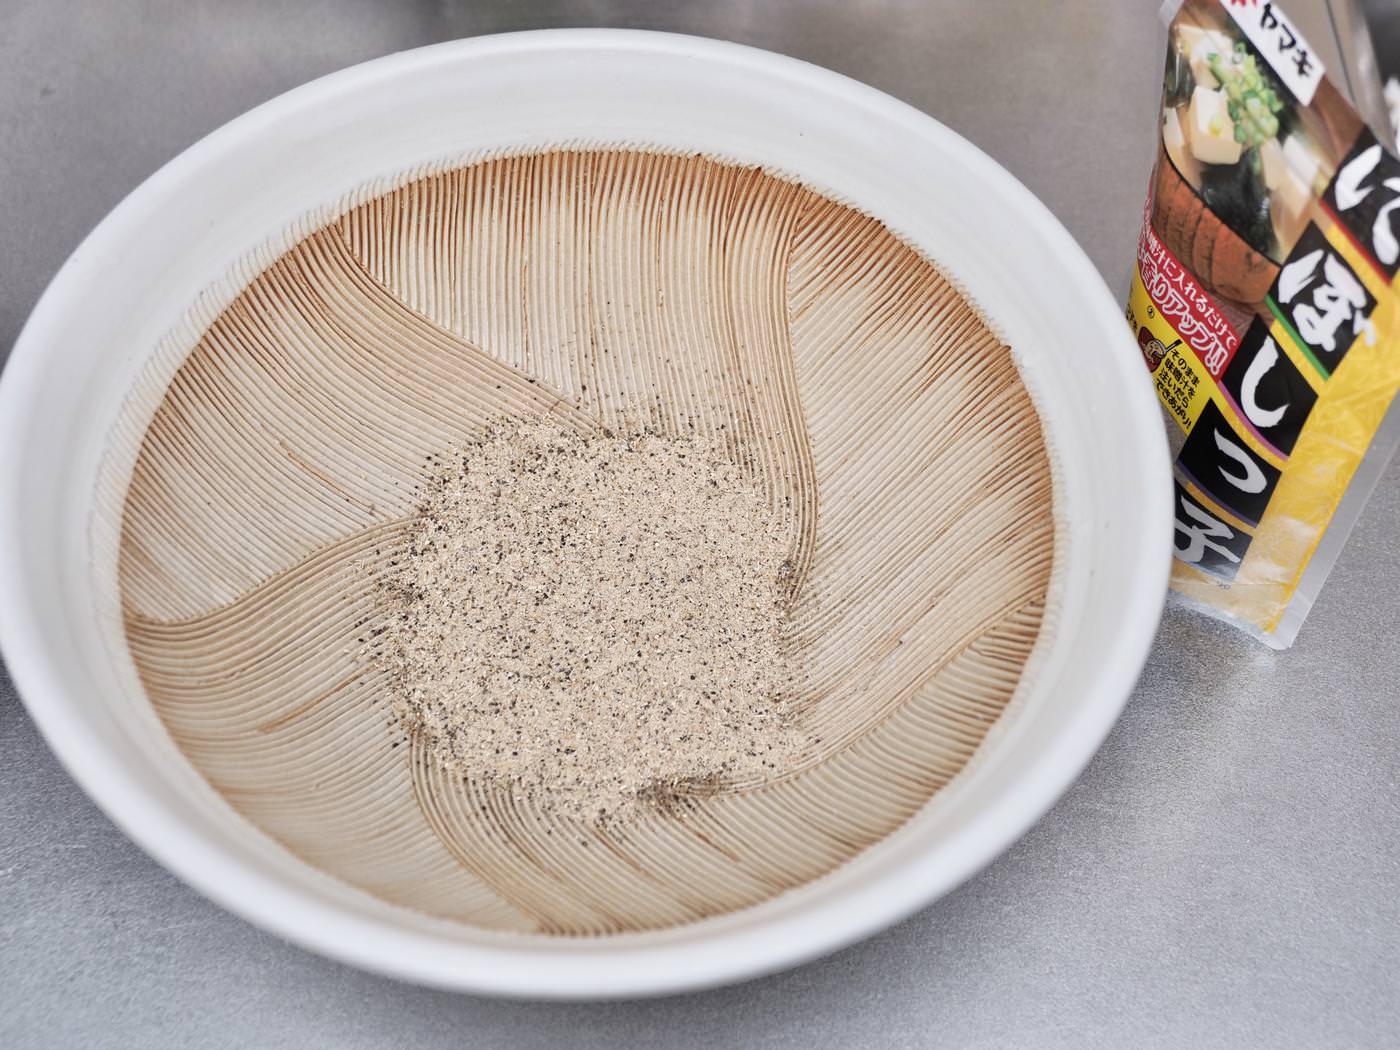 how to make super savory hiyashiru from miyazaki 00007